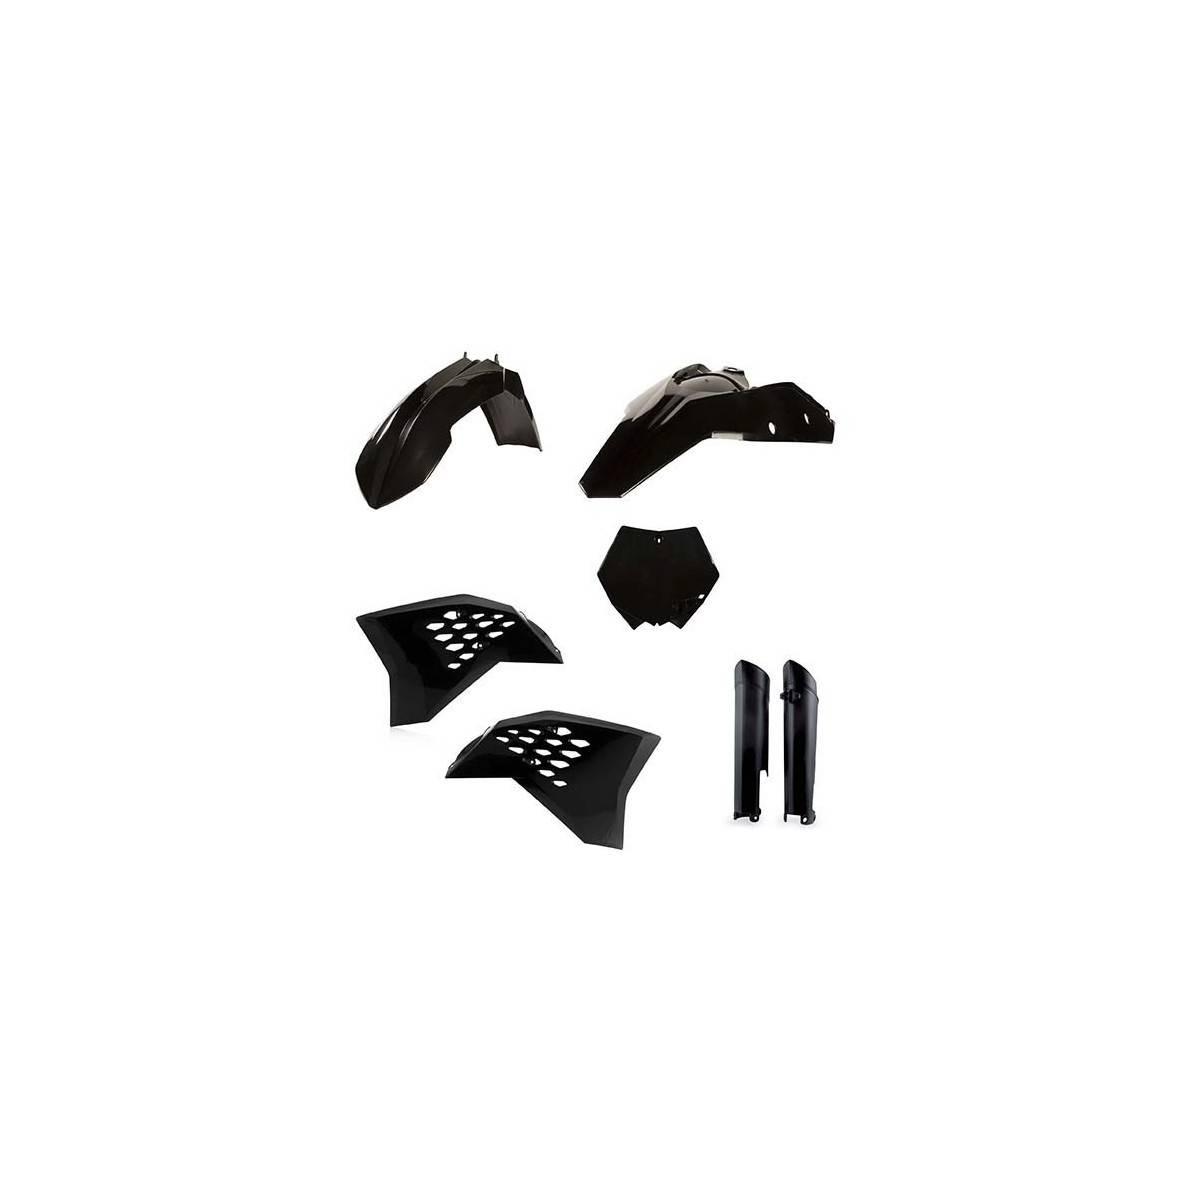 0022808-090 - Full Kit Plasticos Tc85 14 17 Negro